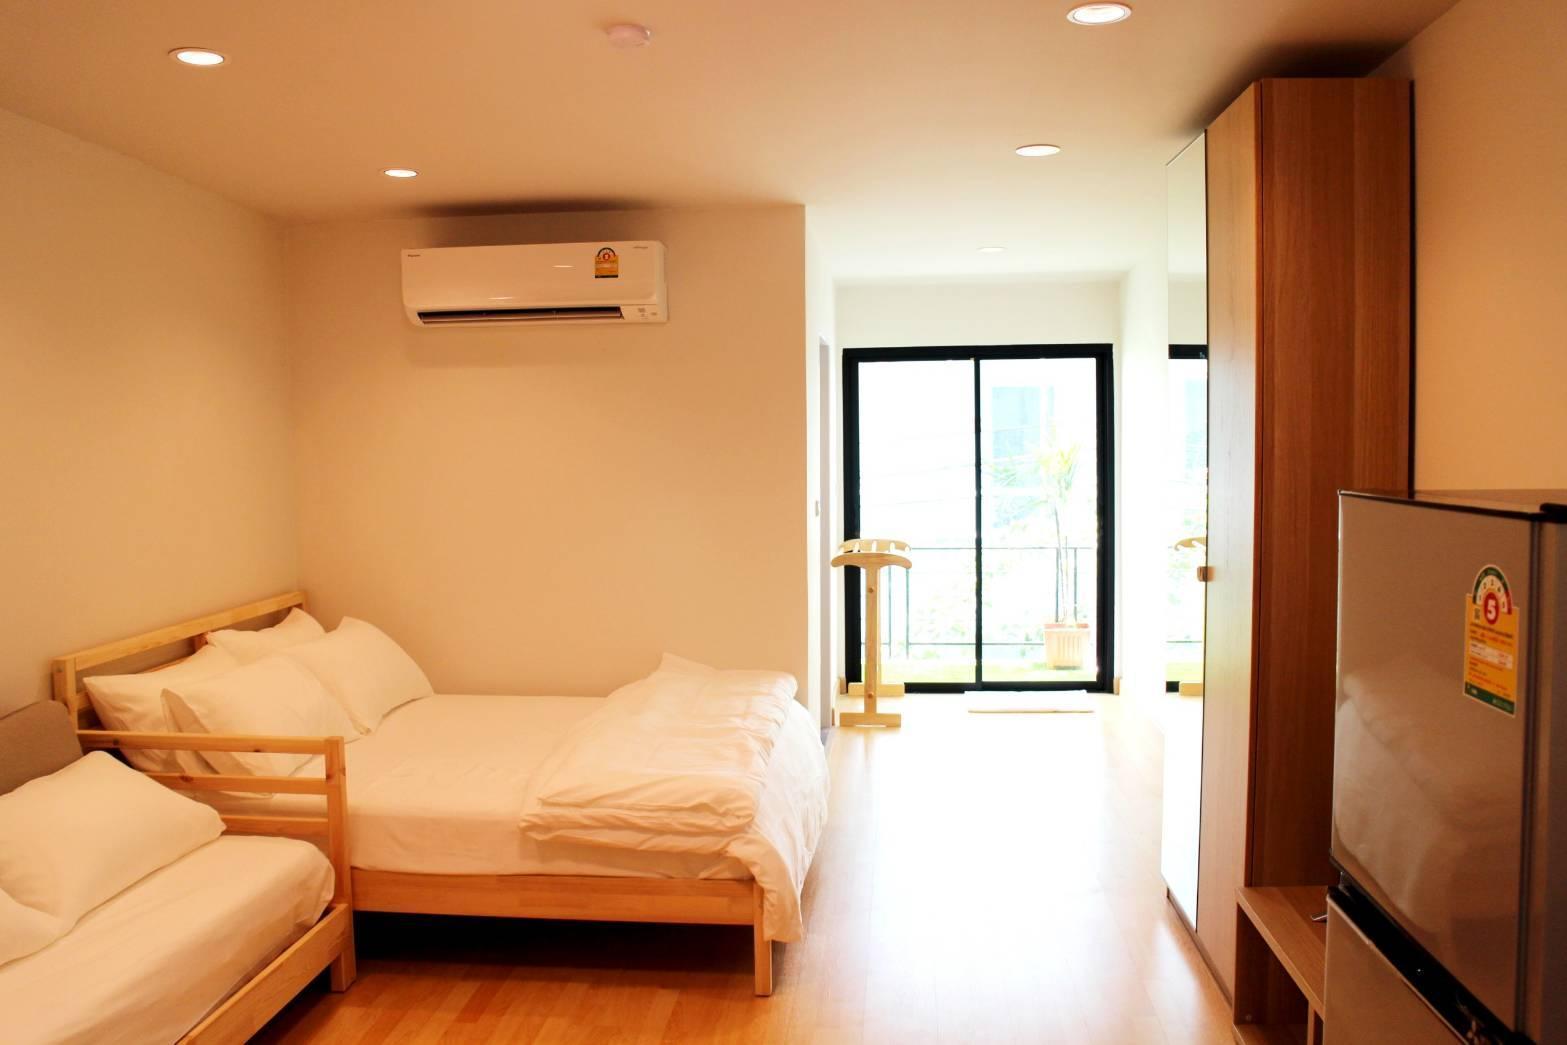 Live like a Local in Ekkamai* Family-freindly Stay อพาร์ตเมนต์ 2 ห้องนอน 2 ห้องน้ำส่วนตัว ขนาด 90 ตร.ม. – สุขุมวิท